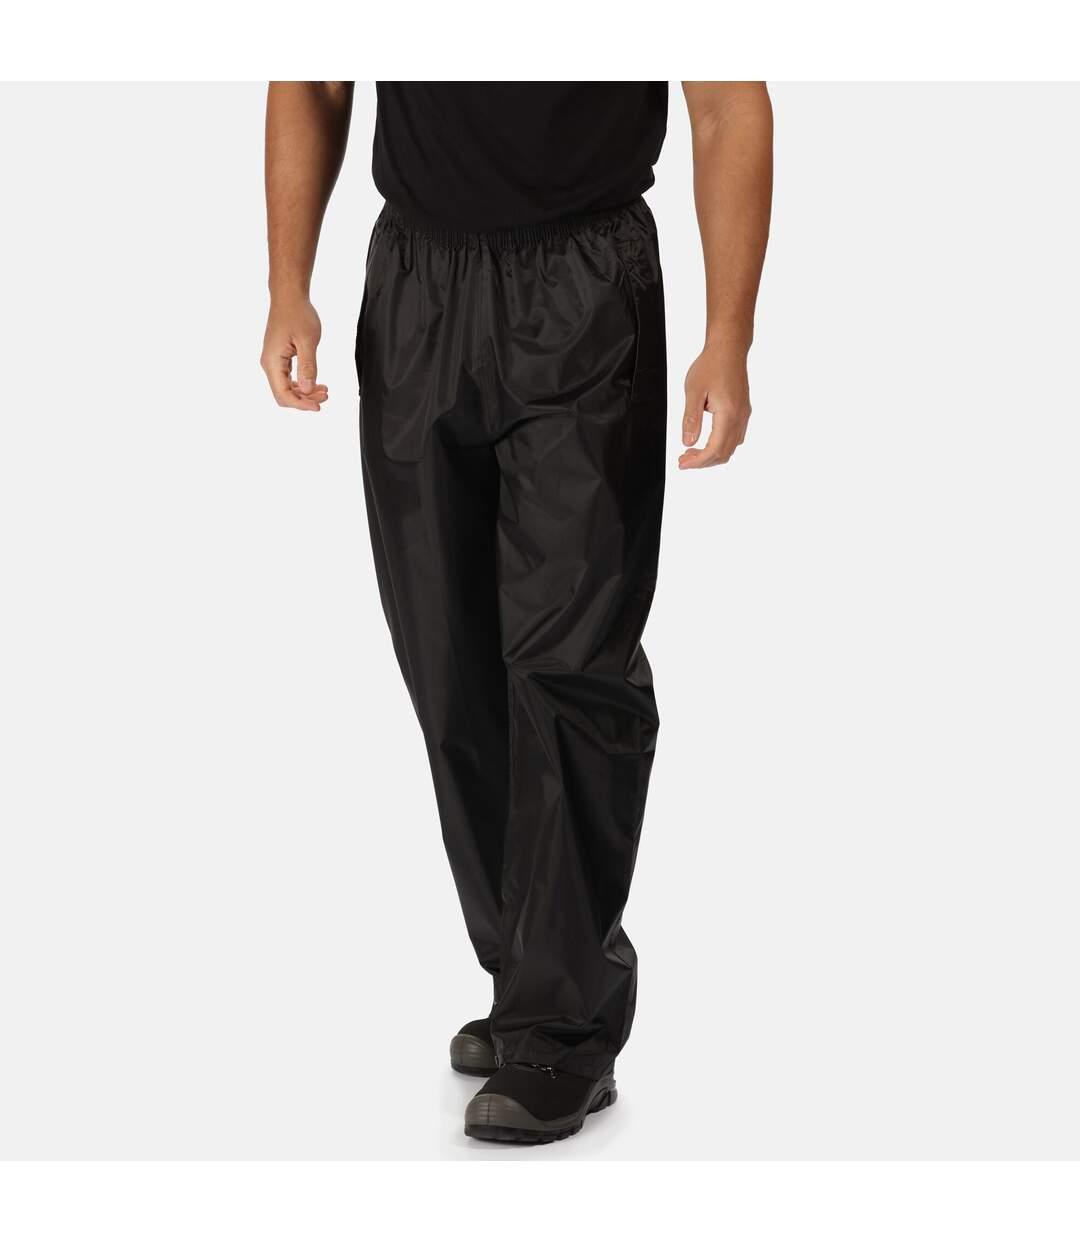 Regatta Professional Mens Pro Stormbreaker Waterproof Overtrousers (Black) - UTRG2375